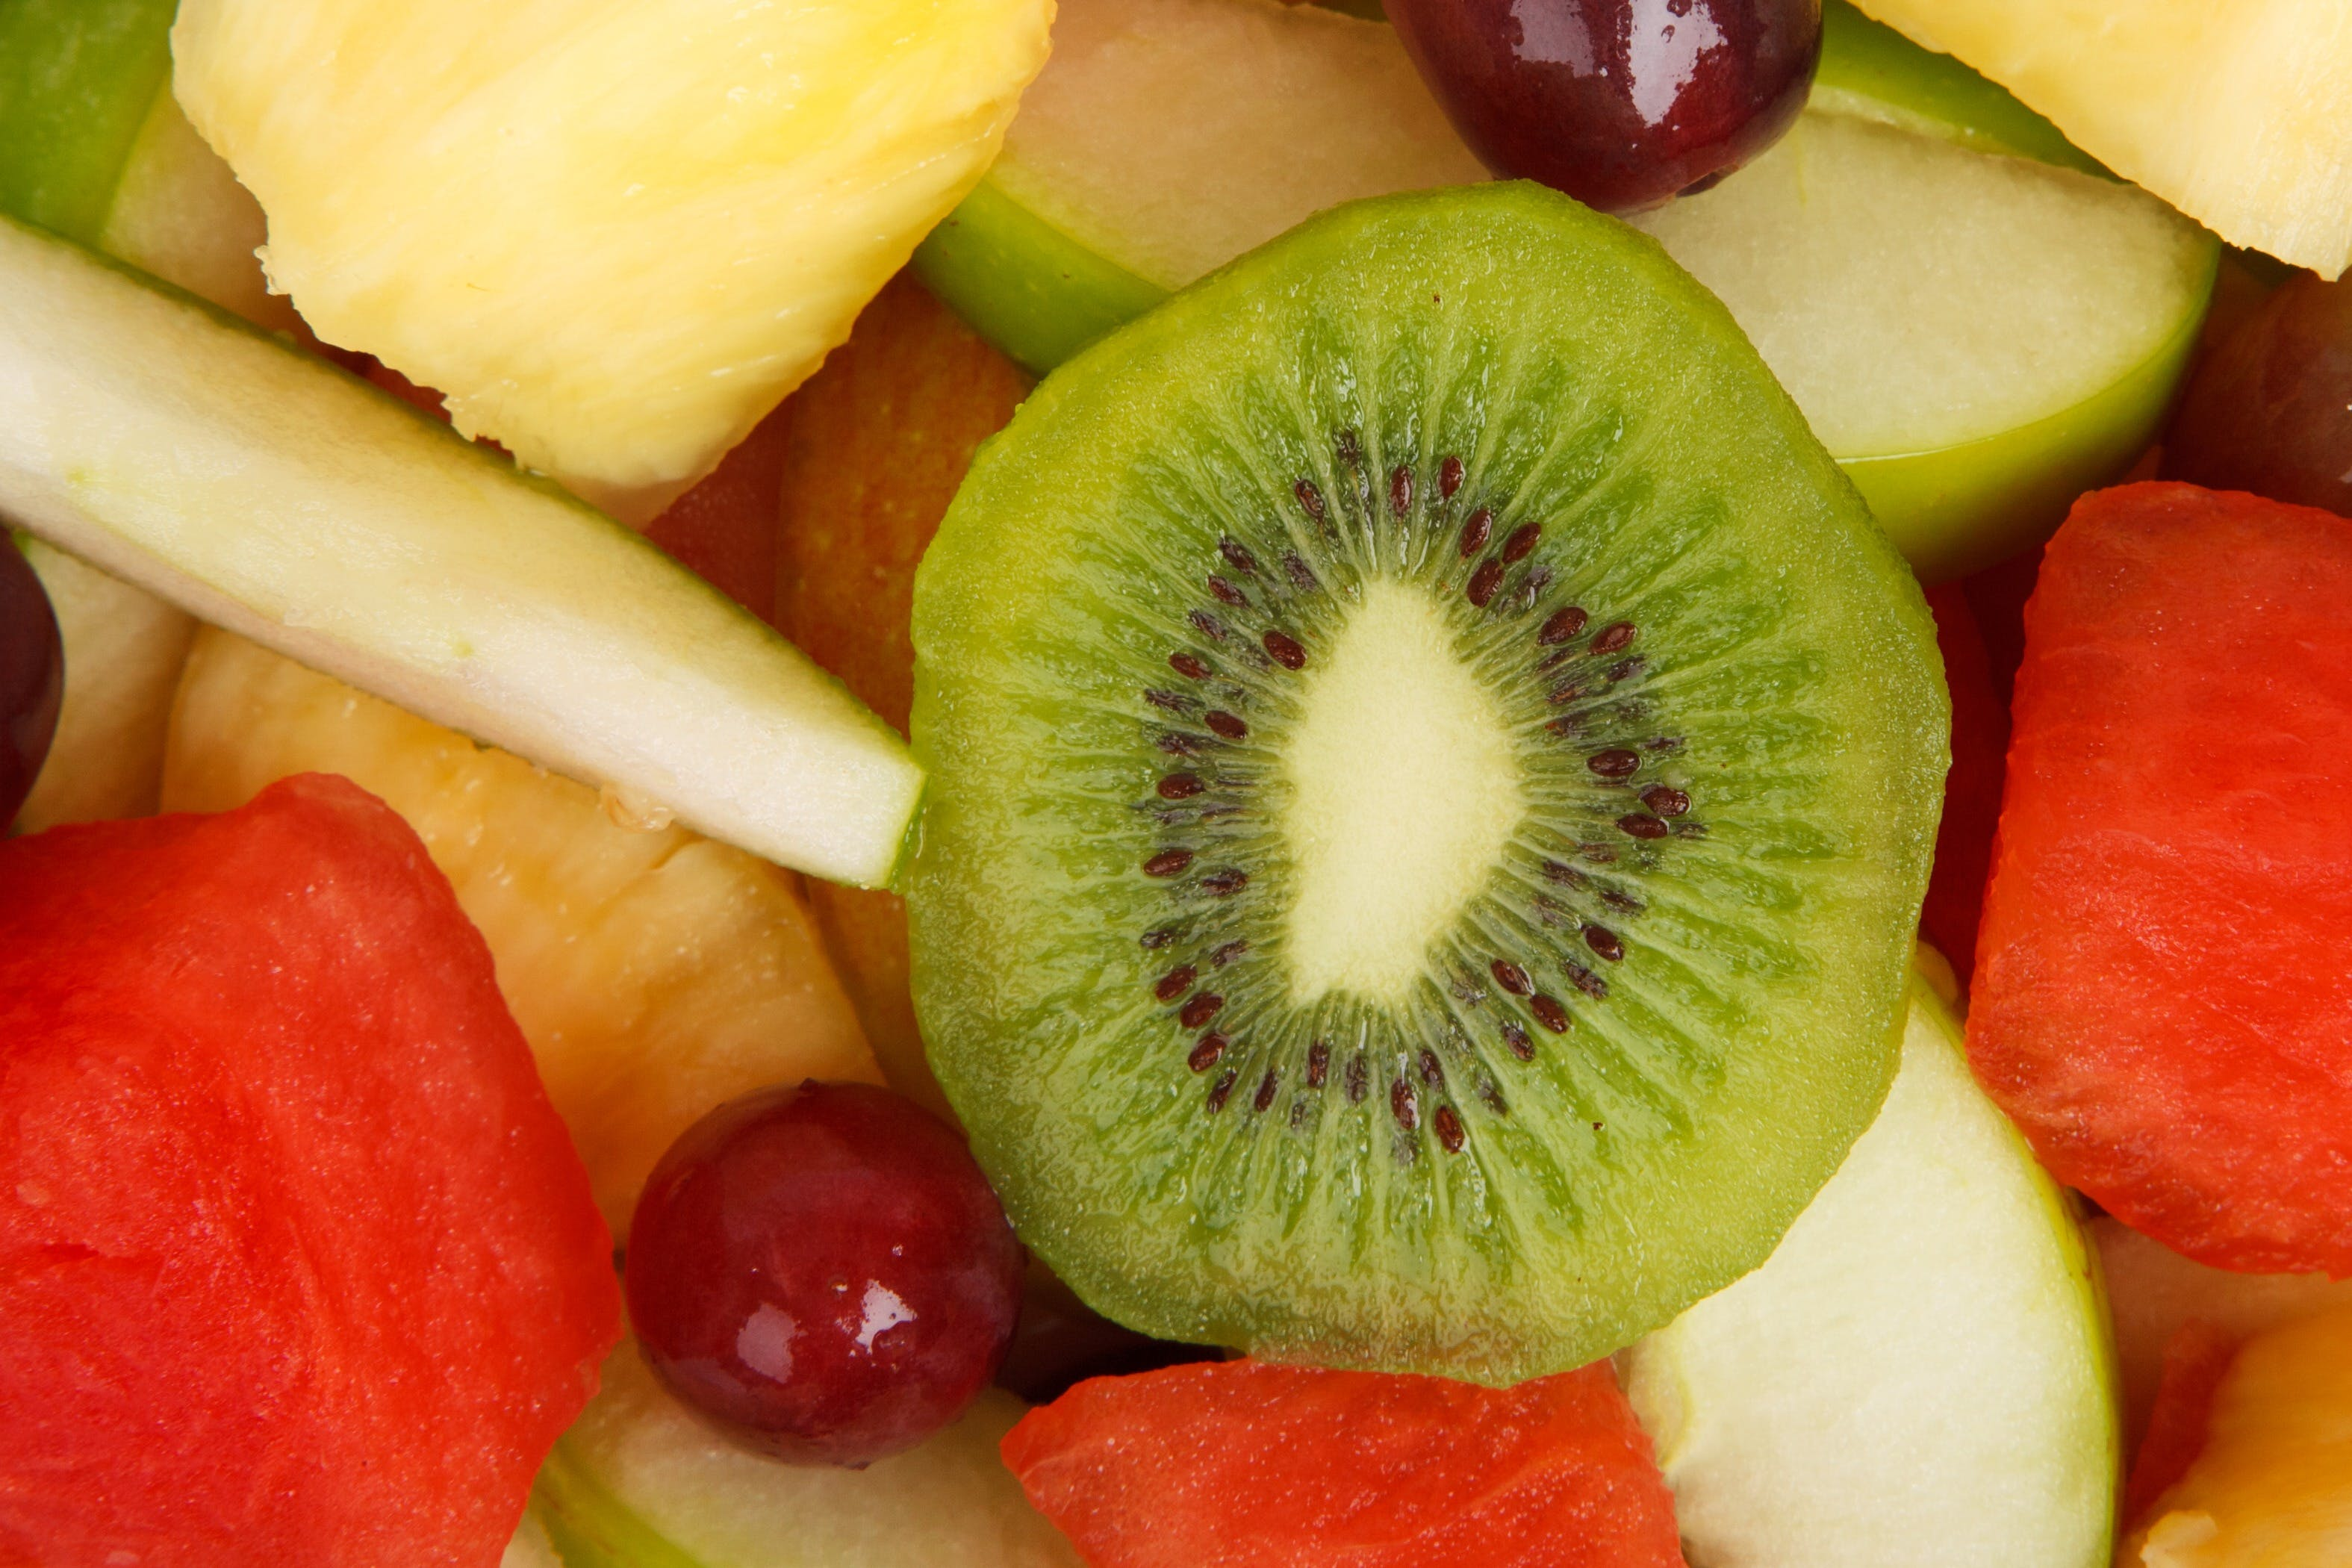 Sliced Green Kiwi